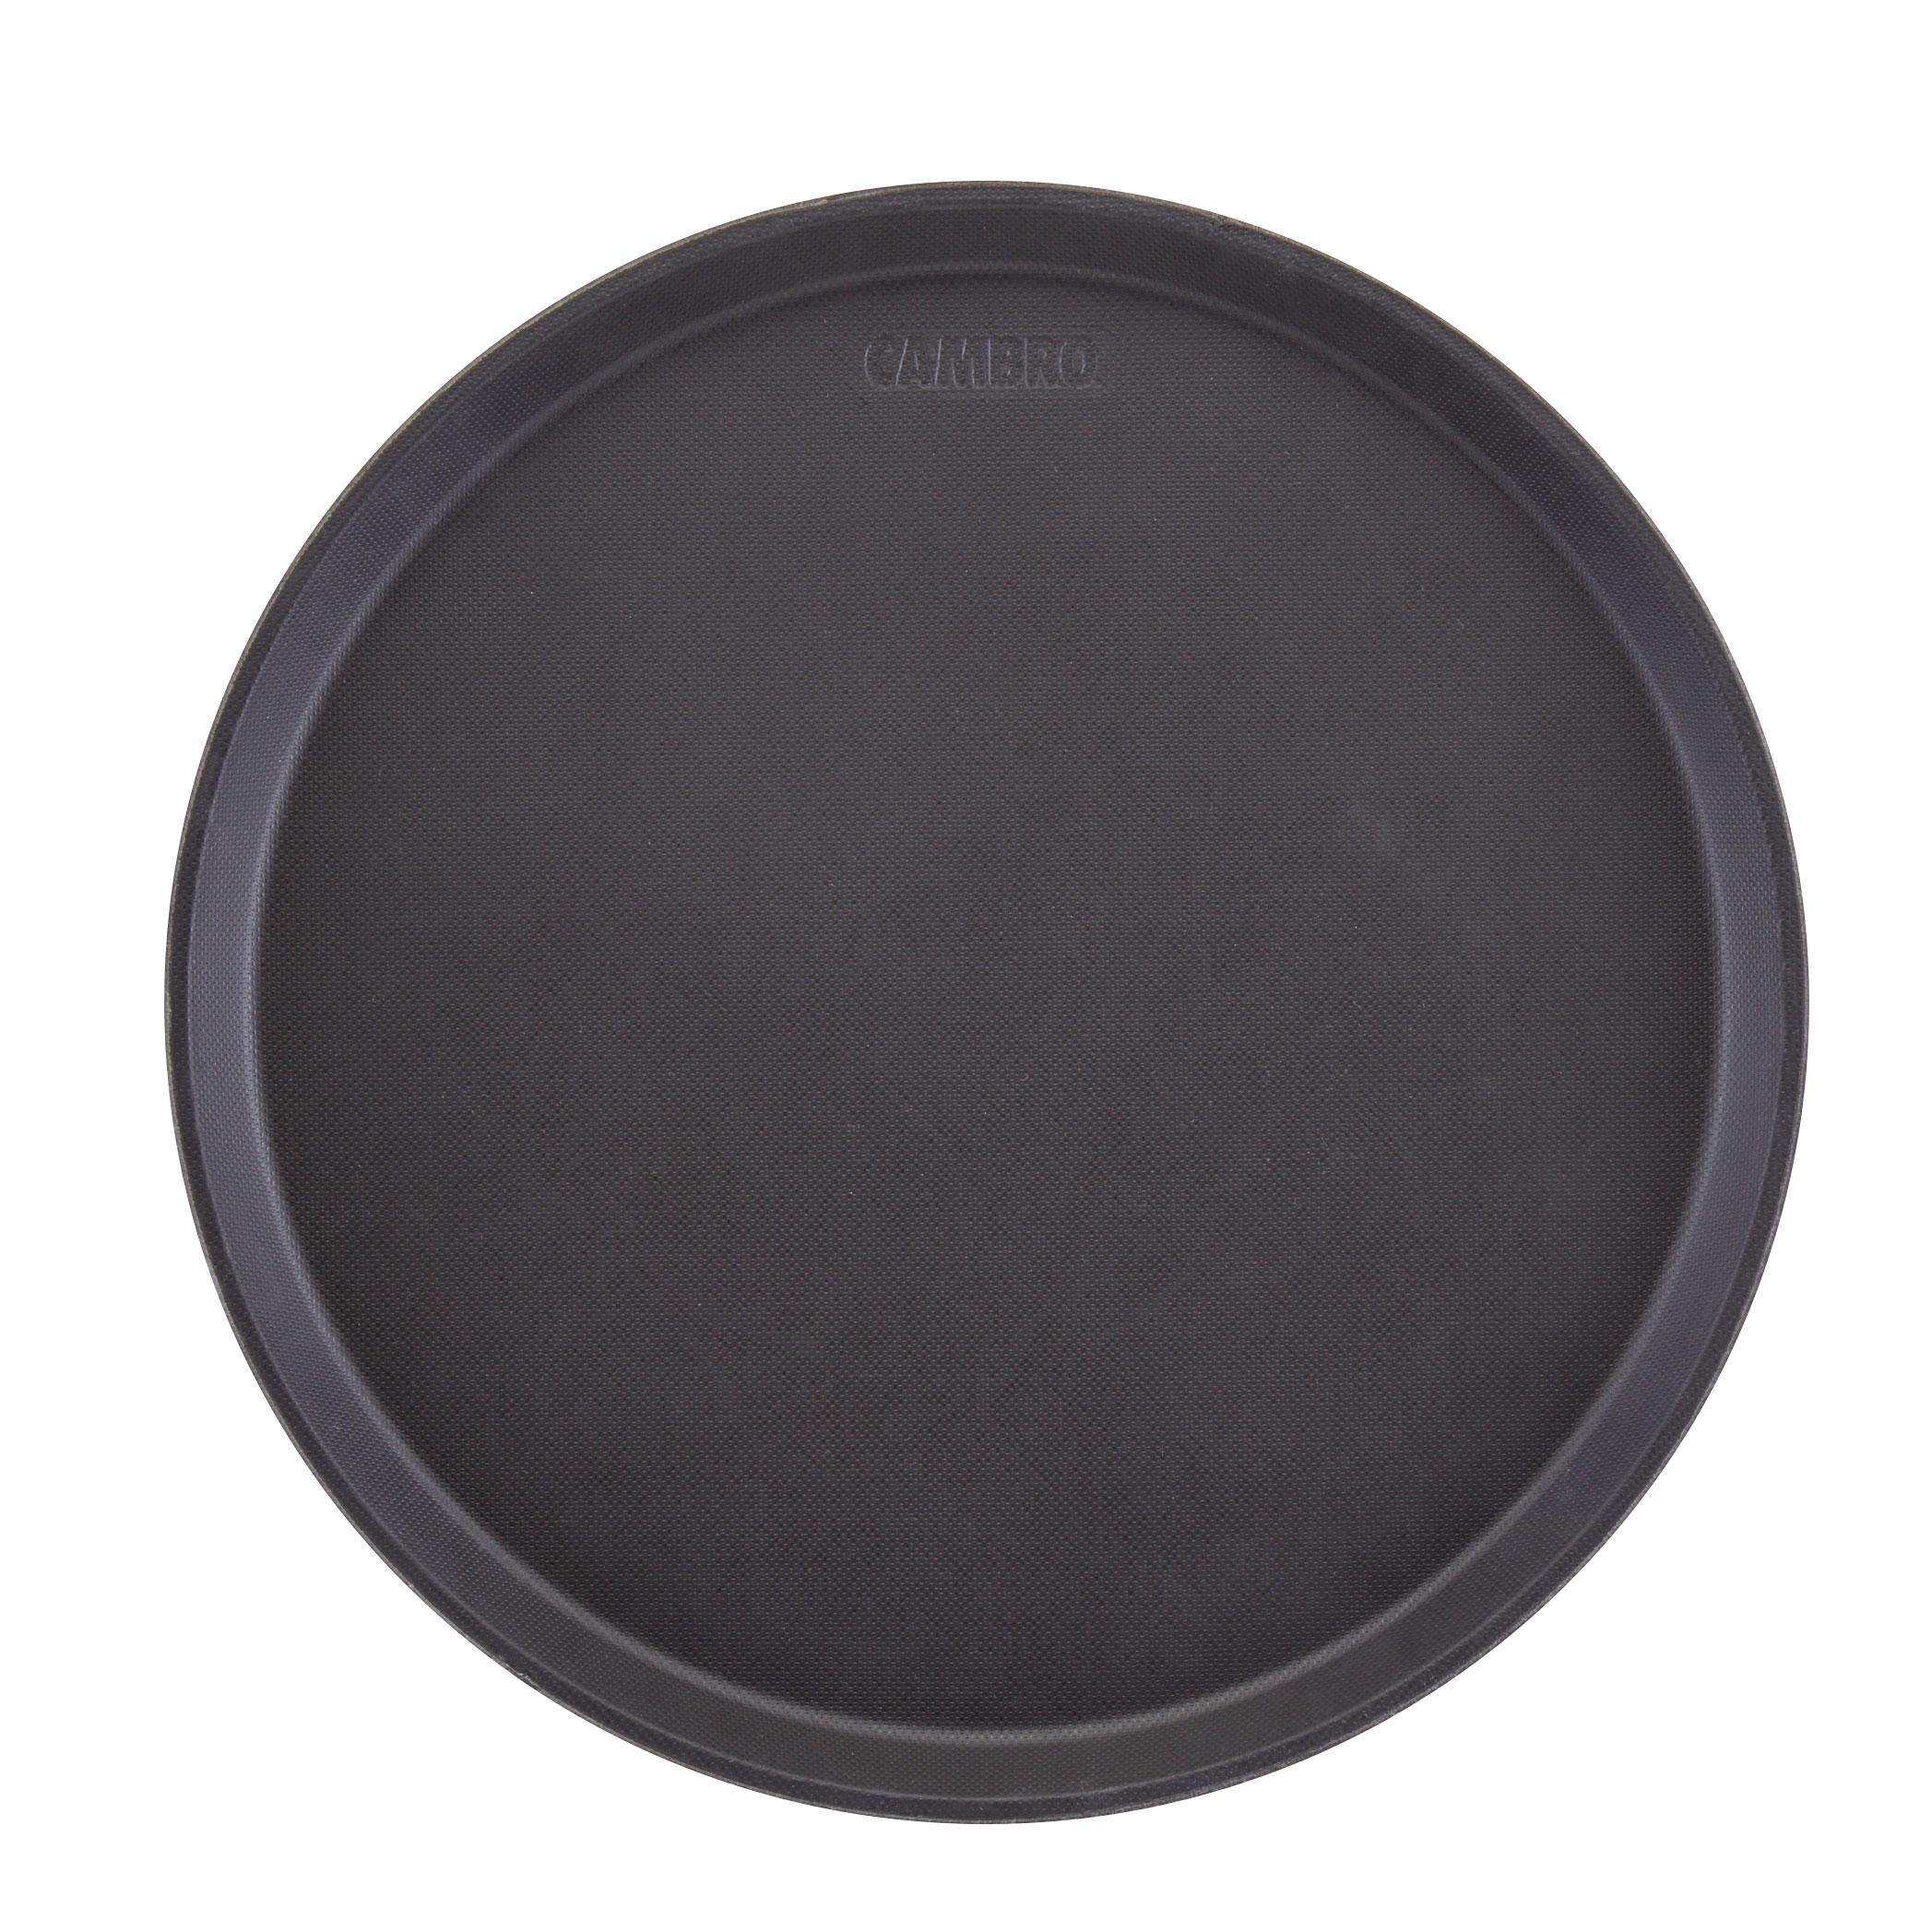 Cambro 1550CT110 serving tray, non-skid